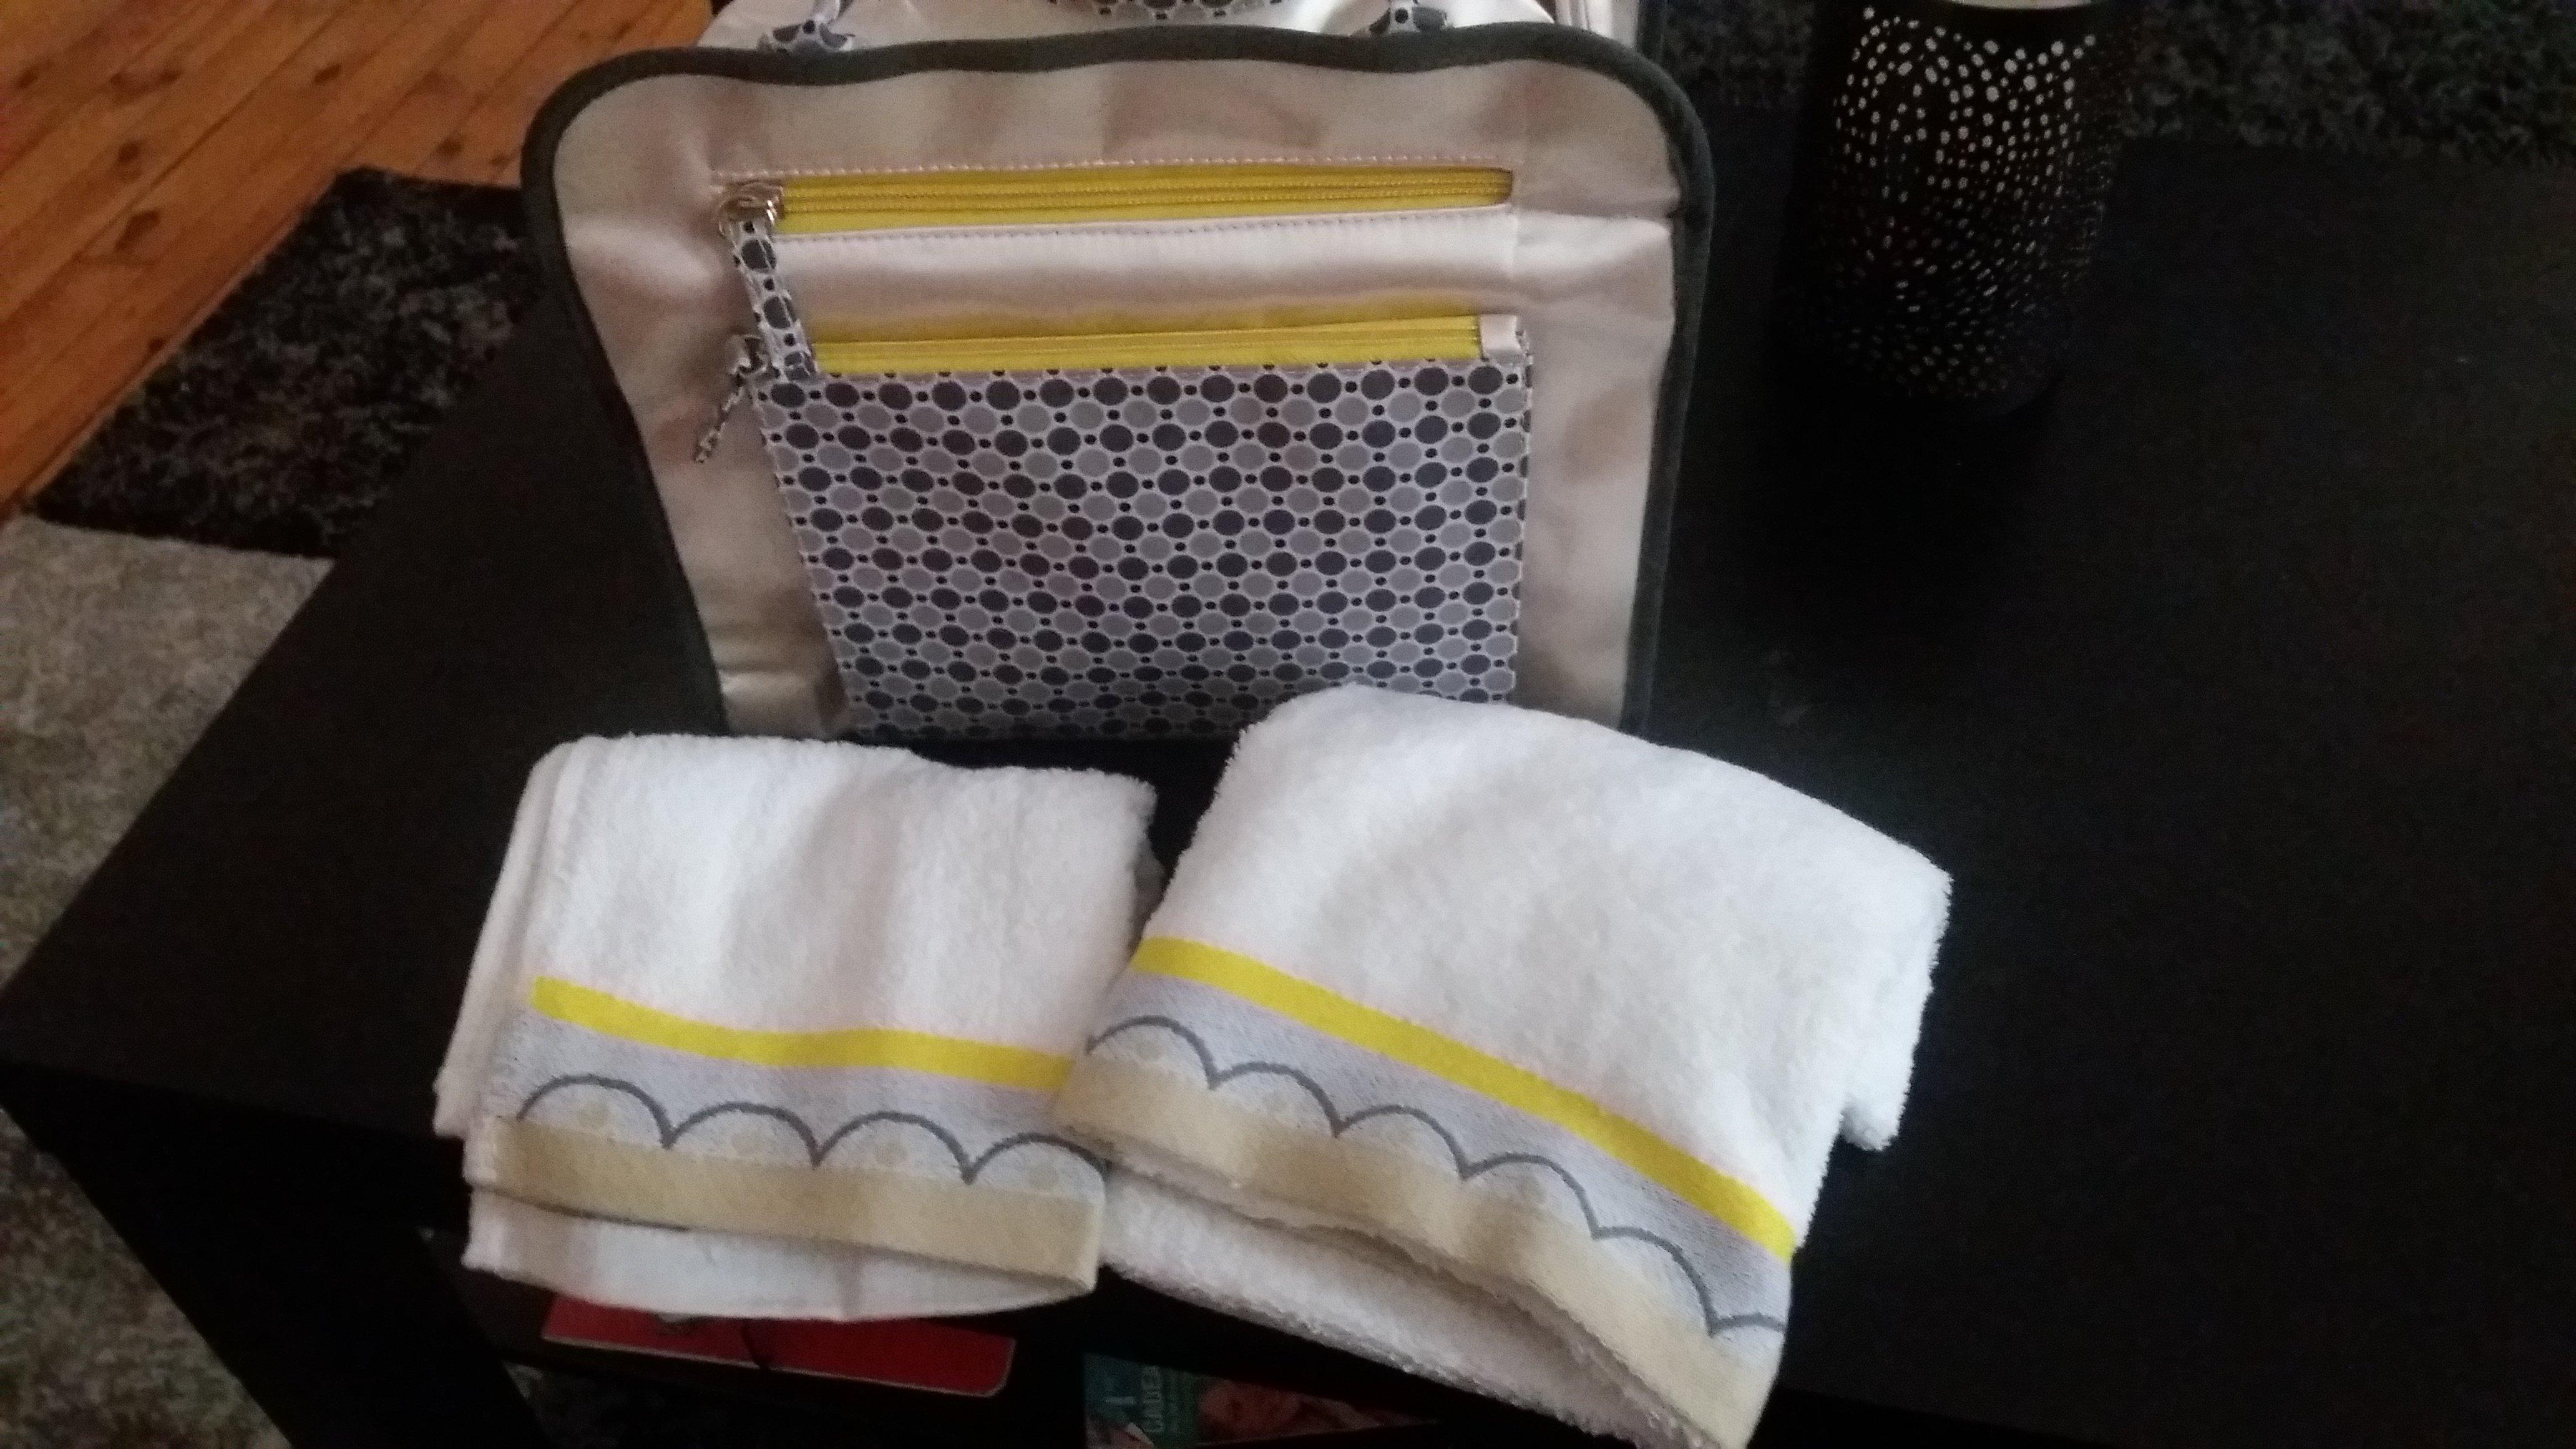 code promo becquet fpg le vanity couture 2 serviettes ponge. Black Bedroom Furniture Sets. Home Design Ideas